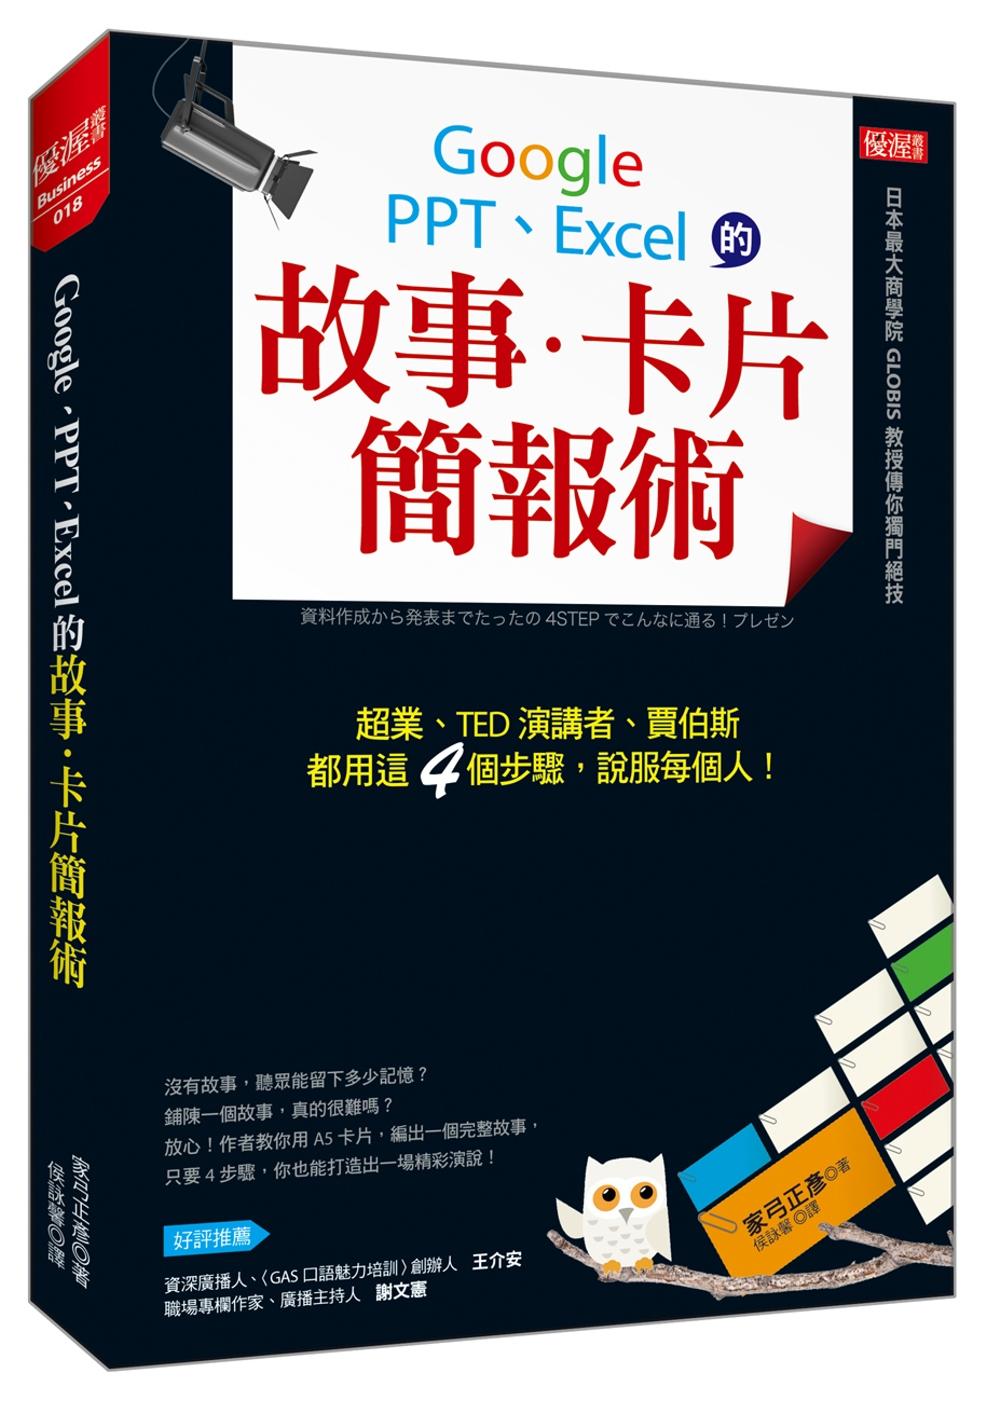 Google、PPT、Excel的 故事.卡片簡報術:超業、TED演講者、賈伯斯都用這4個